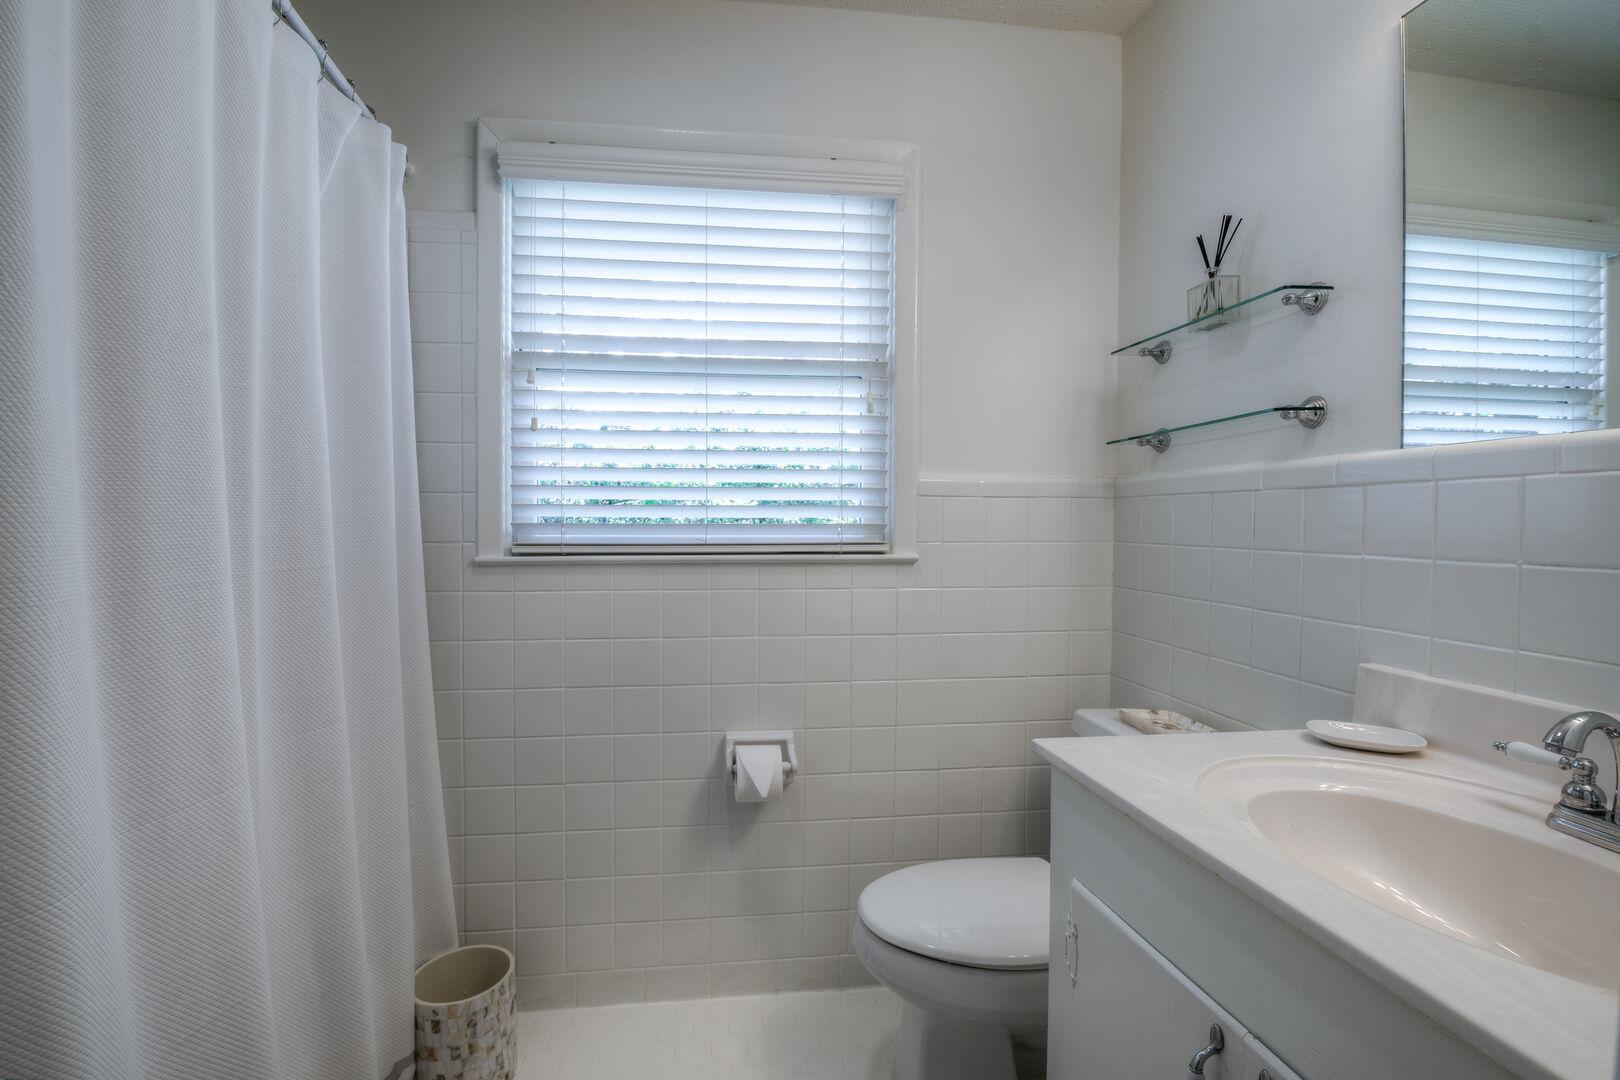 Bathroom - Next to King Bedroom